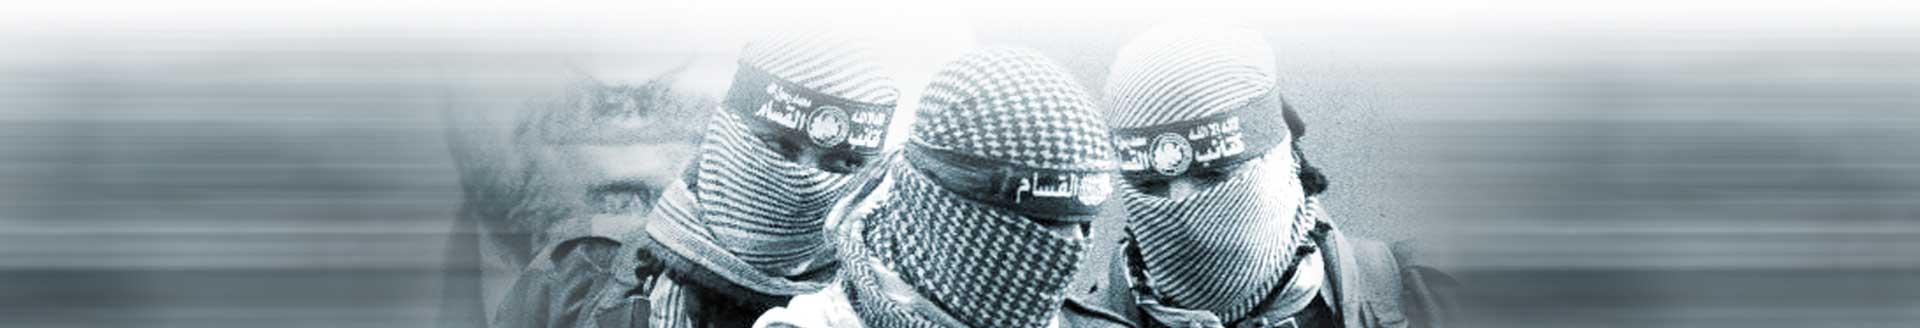 Linde v. Arab Bank Plc - Osen LLC